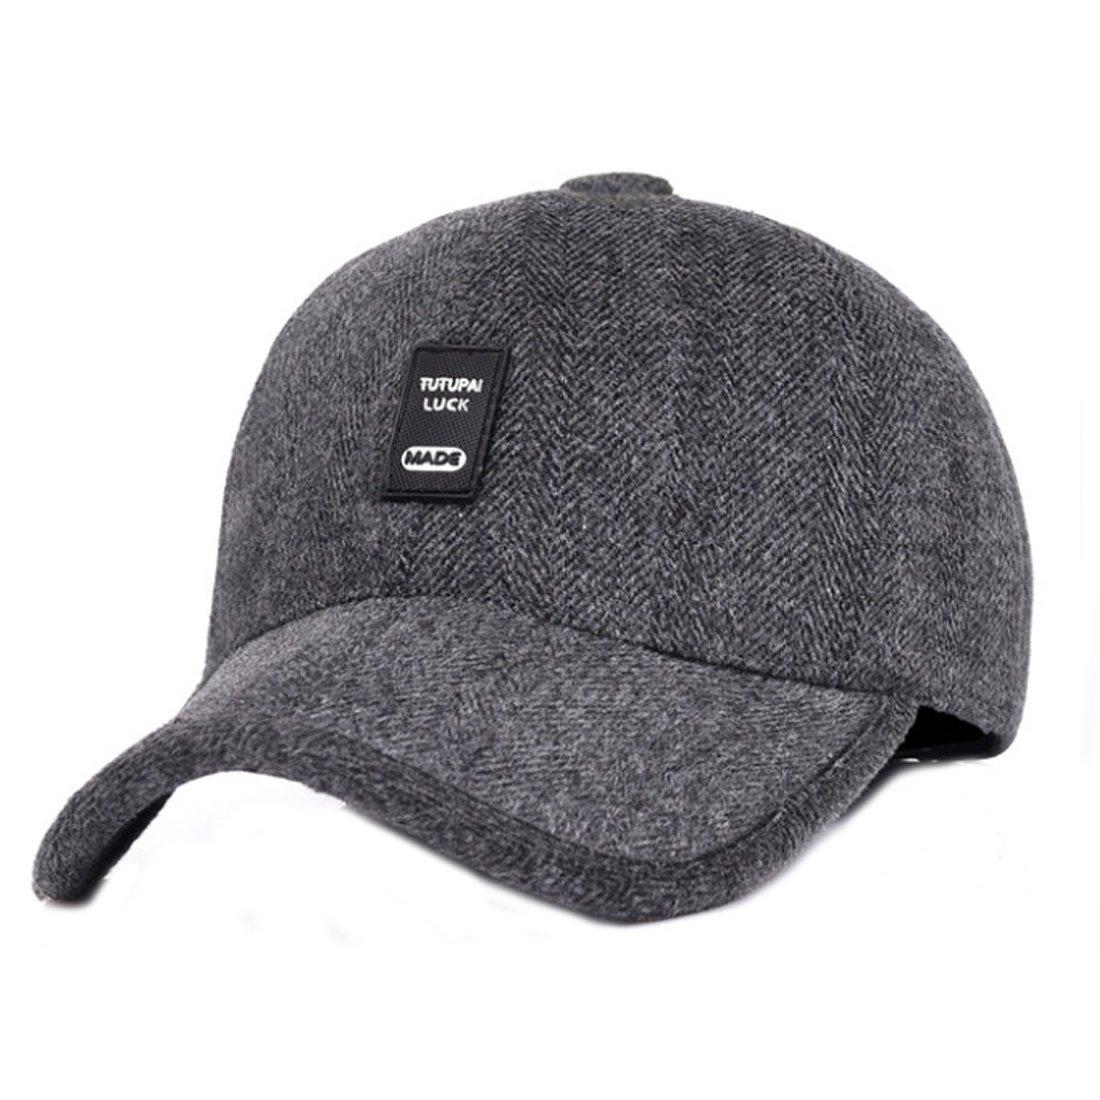 King Star Mens Winter Warm Wool Baseball Caps Hat with Fold Earflap